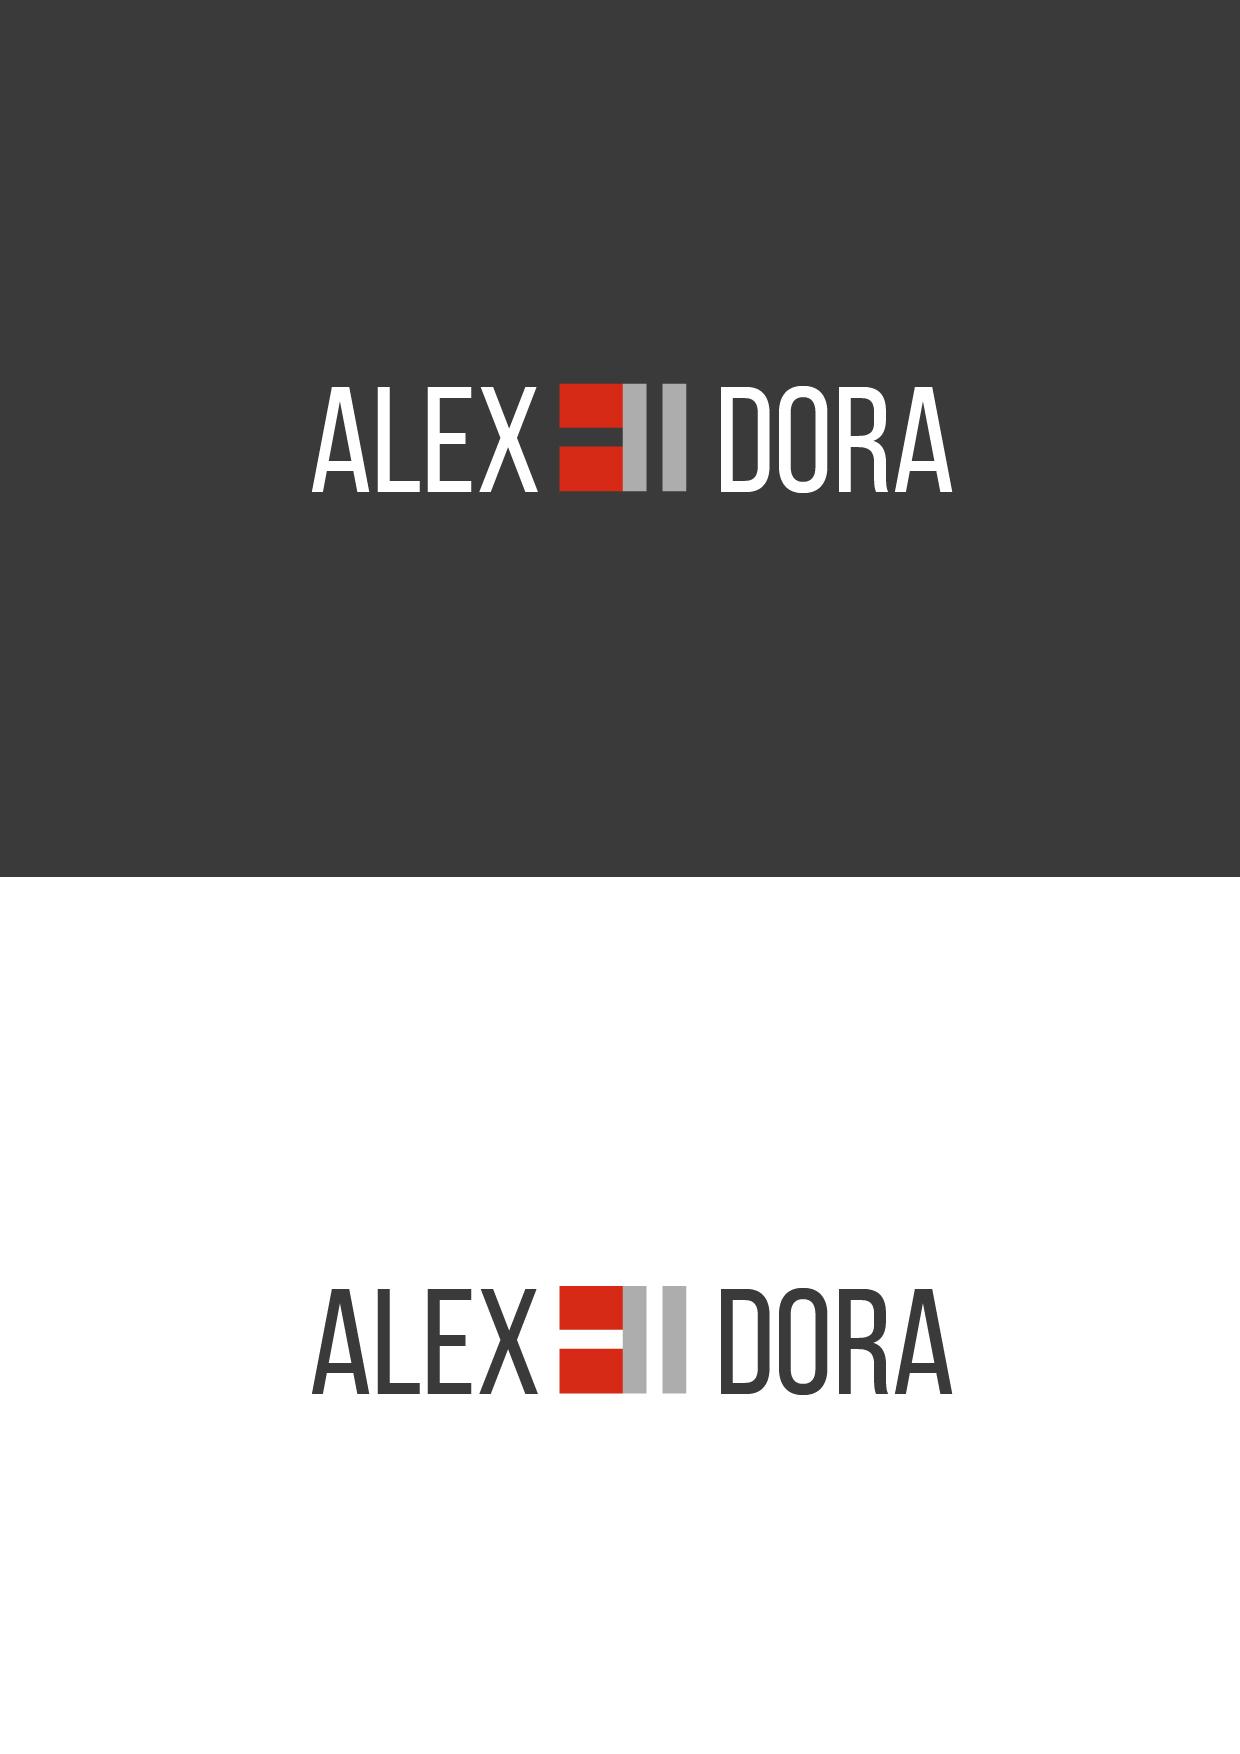 Необходим дизайнер для доработки логотипа бренда одежды фото f_8525b366dff4f816.jpg